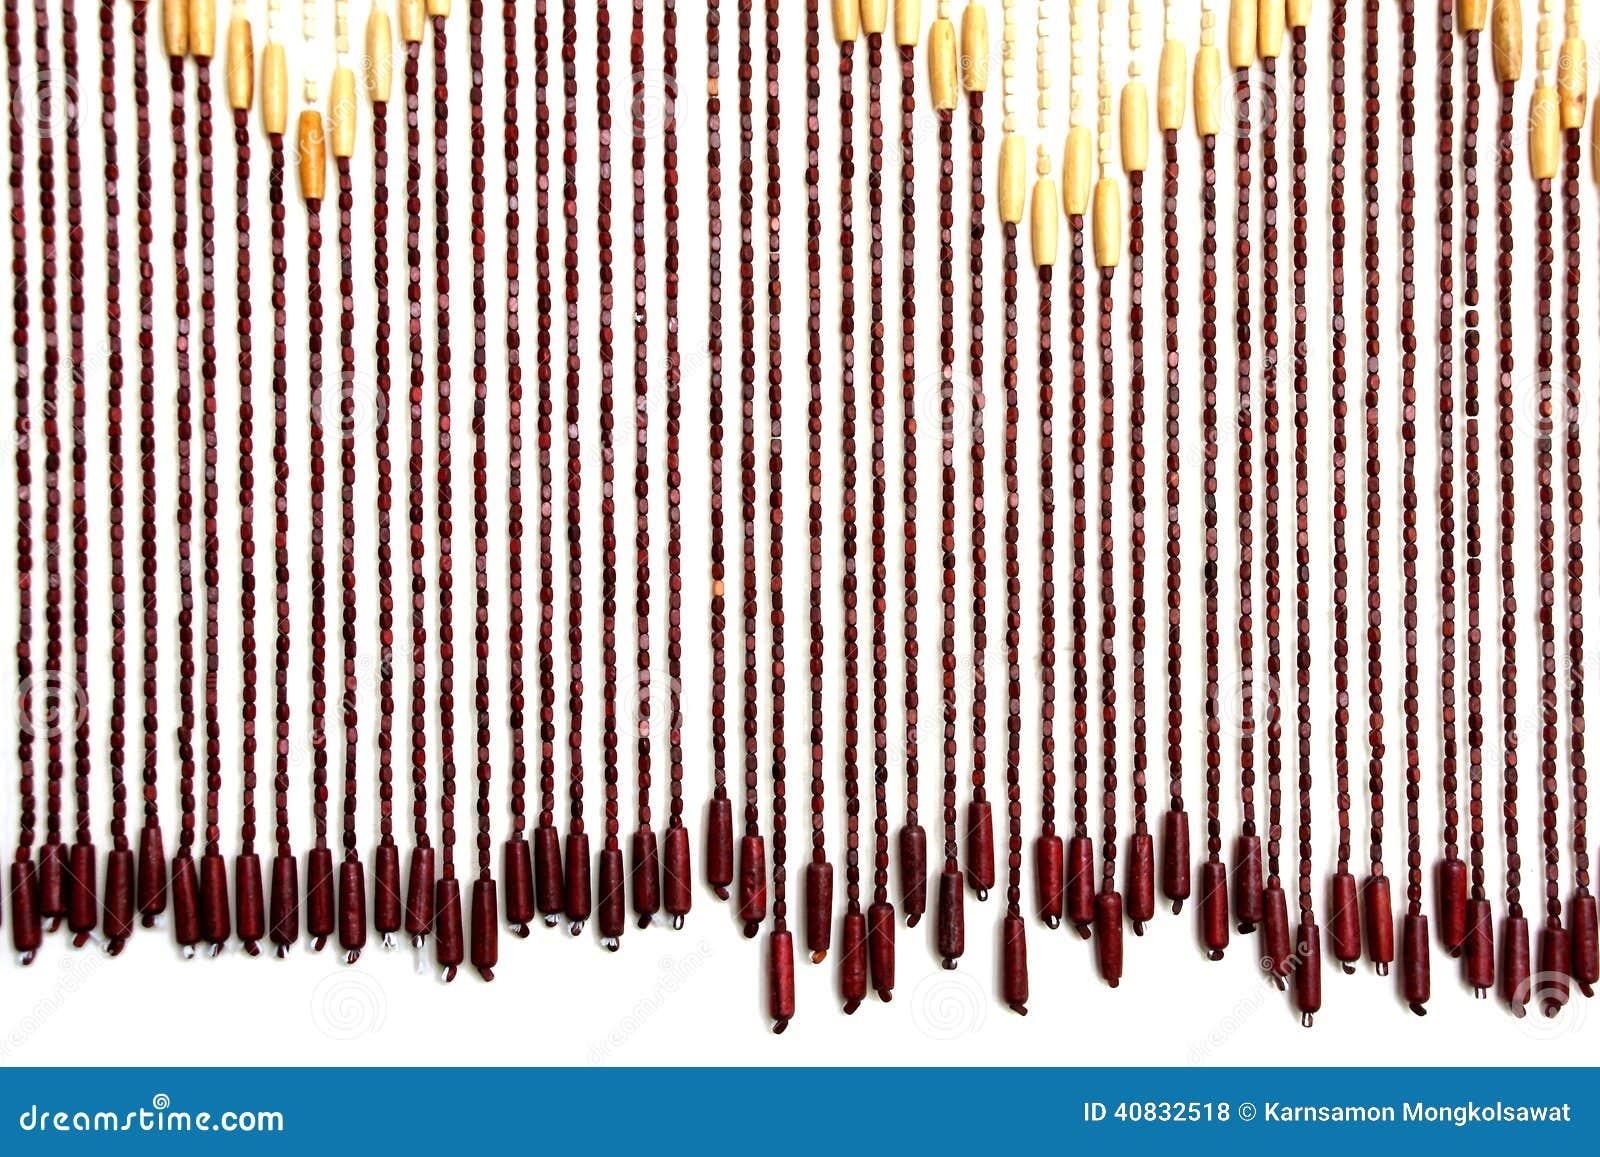 Wooden Bead Curtain Stock Photo - Image: 40832518